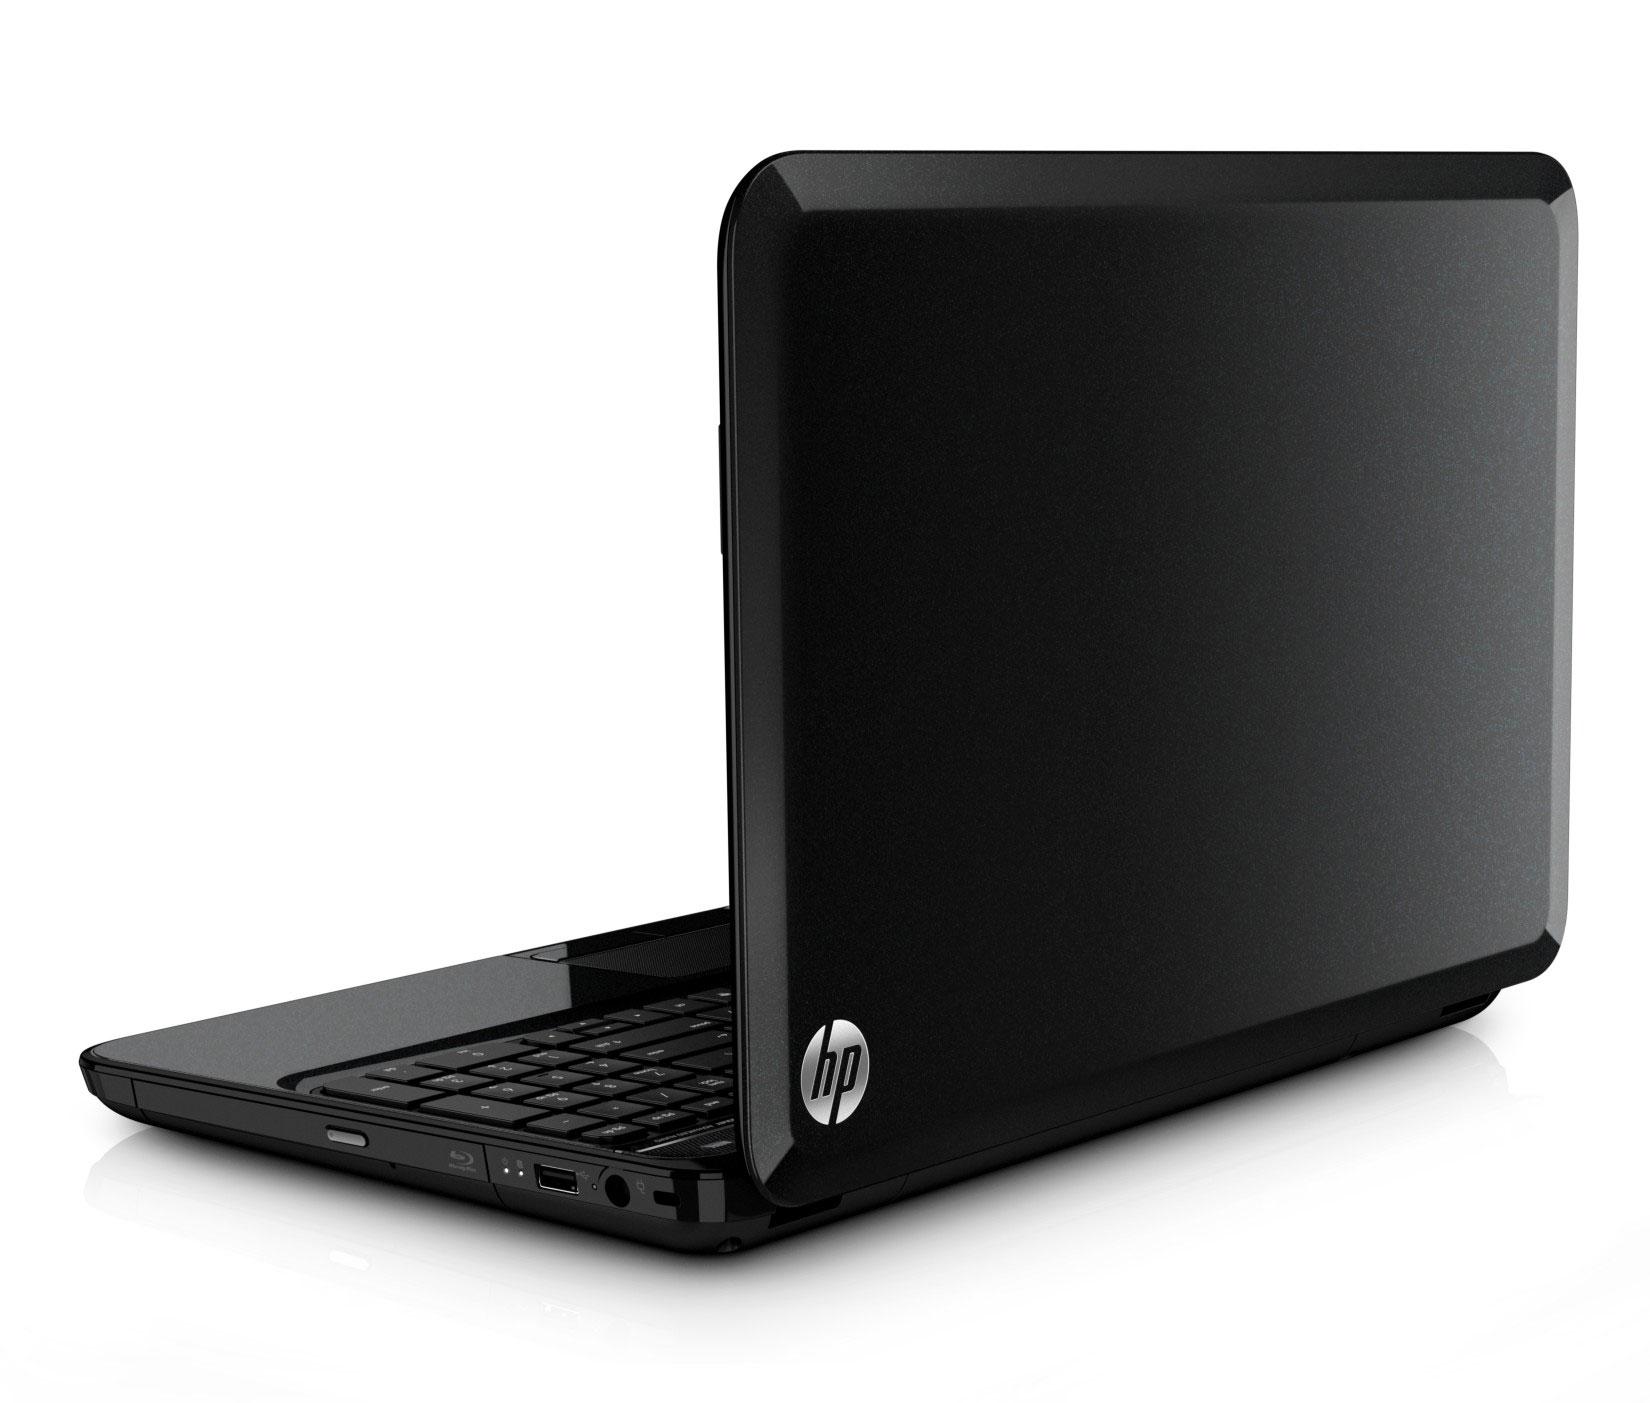 HP Pavilion g6-2022sa 15.6 inch Laptop (Intel Core i3 ... Hp Laptops Pavilion G6